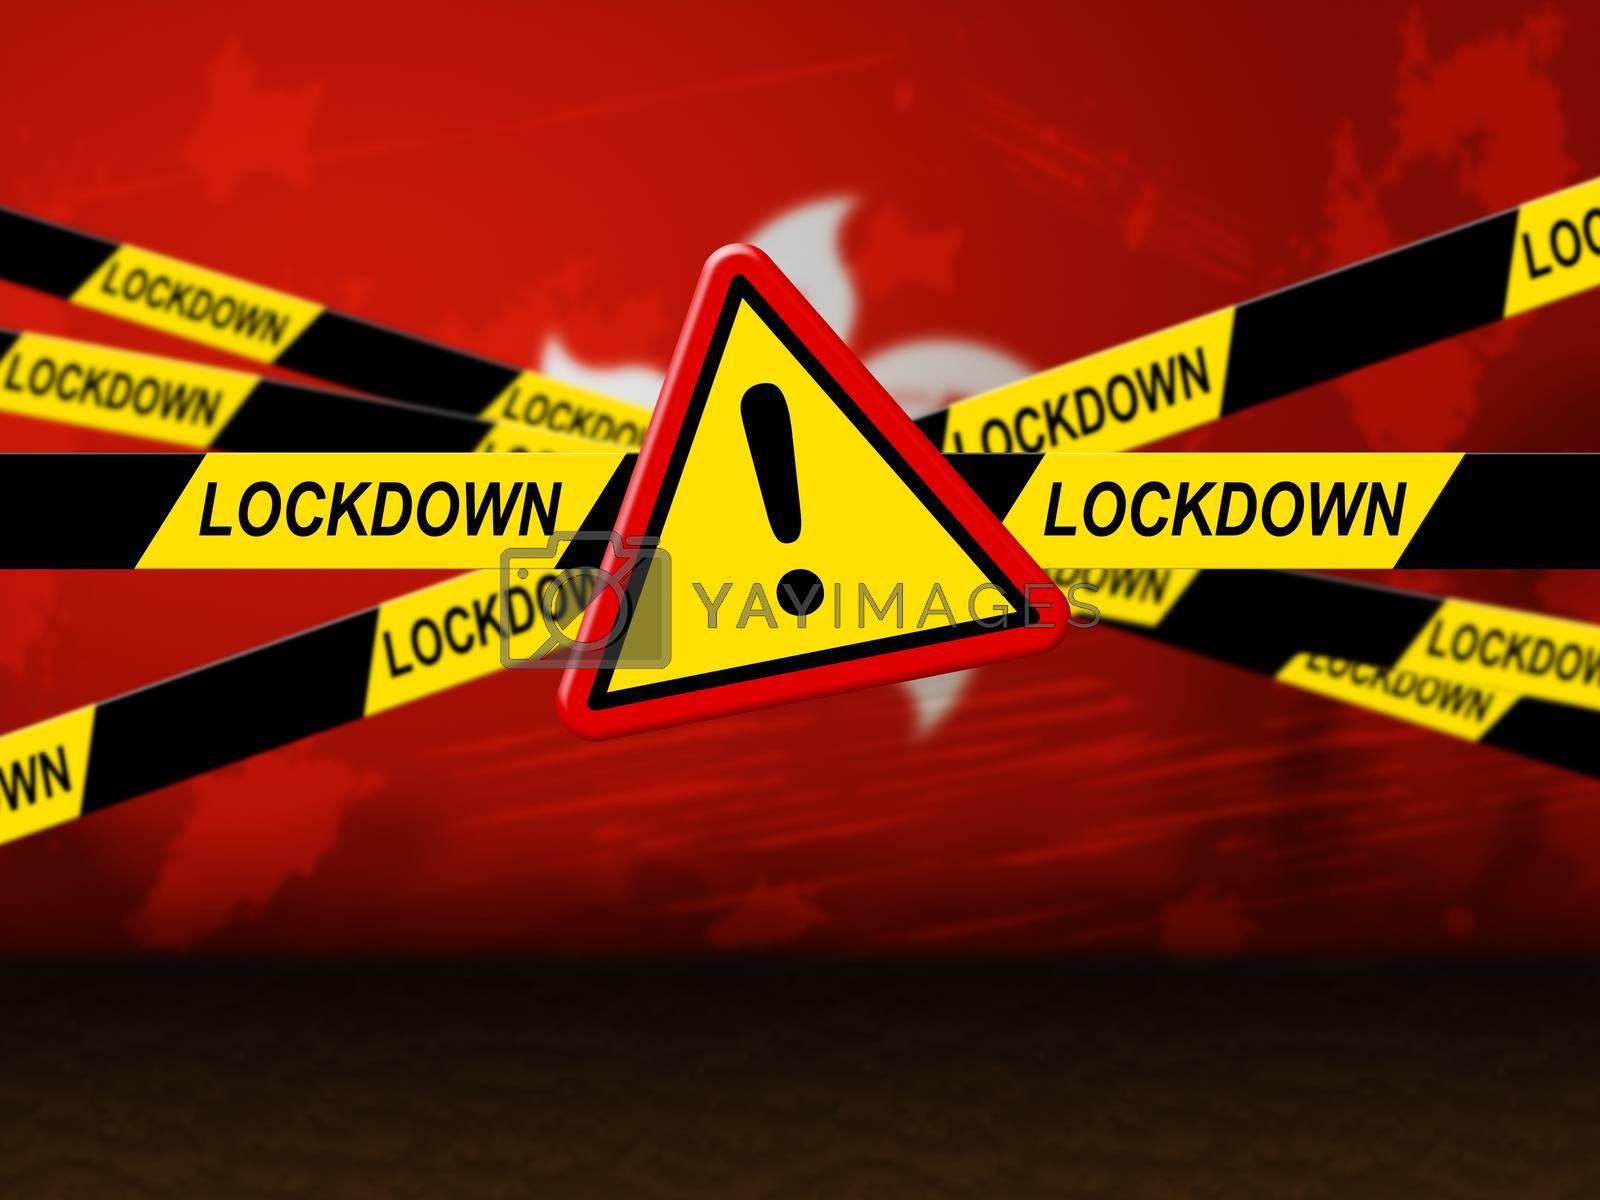 Hong Kong lockdown preventing coronavirus spread or outbreak. Covid 19 HK precaution to lock down virus infection - 3d Illustration